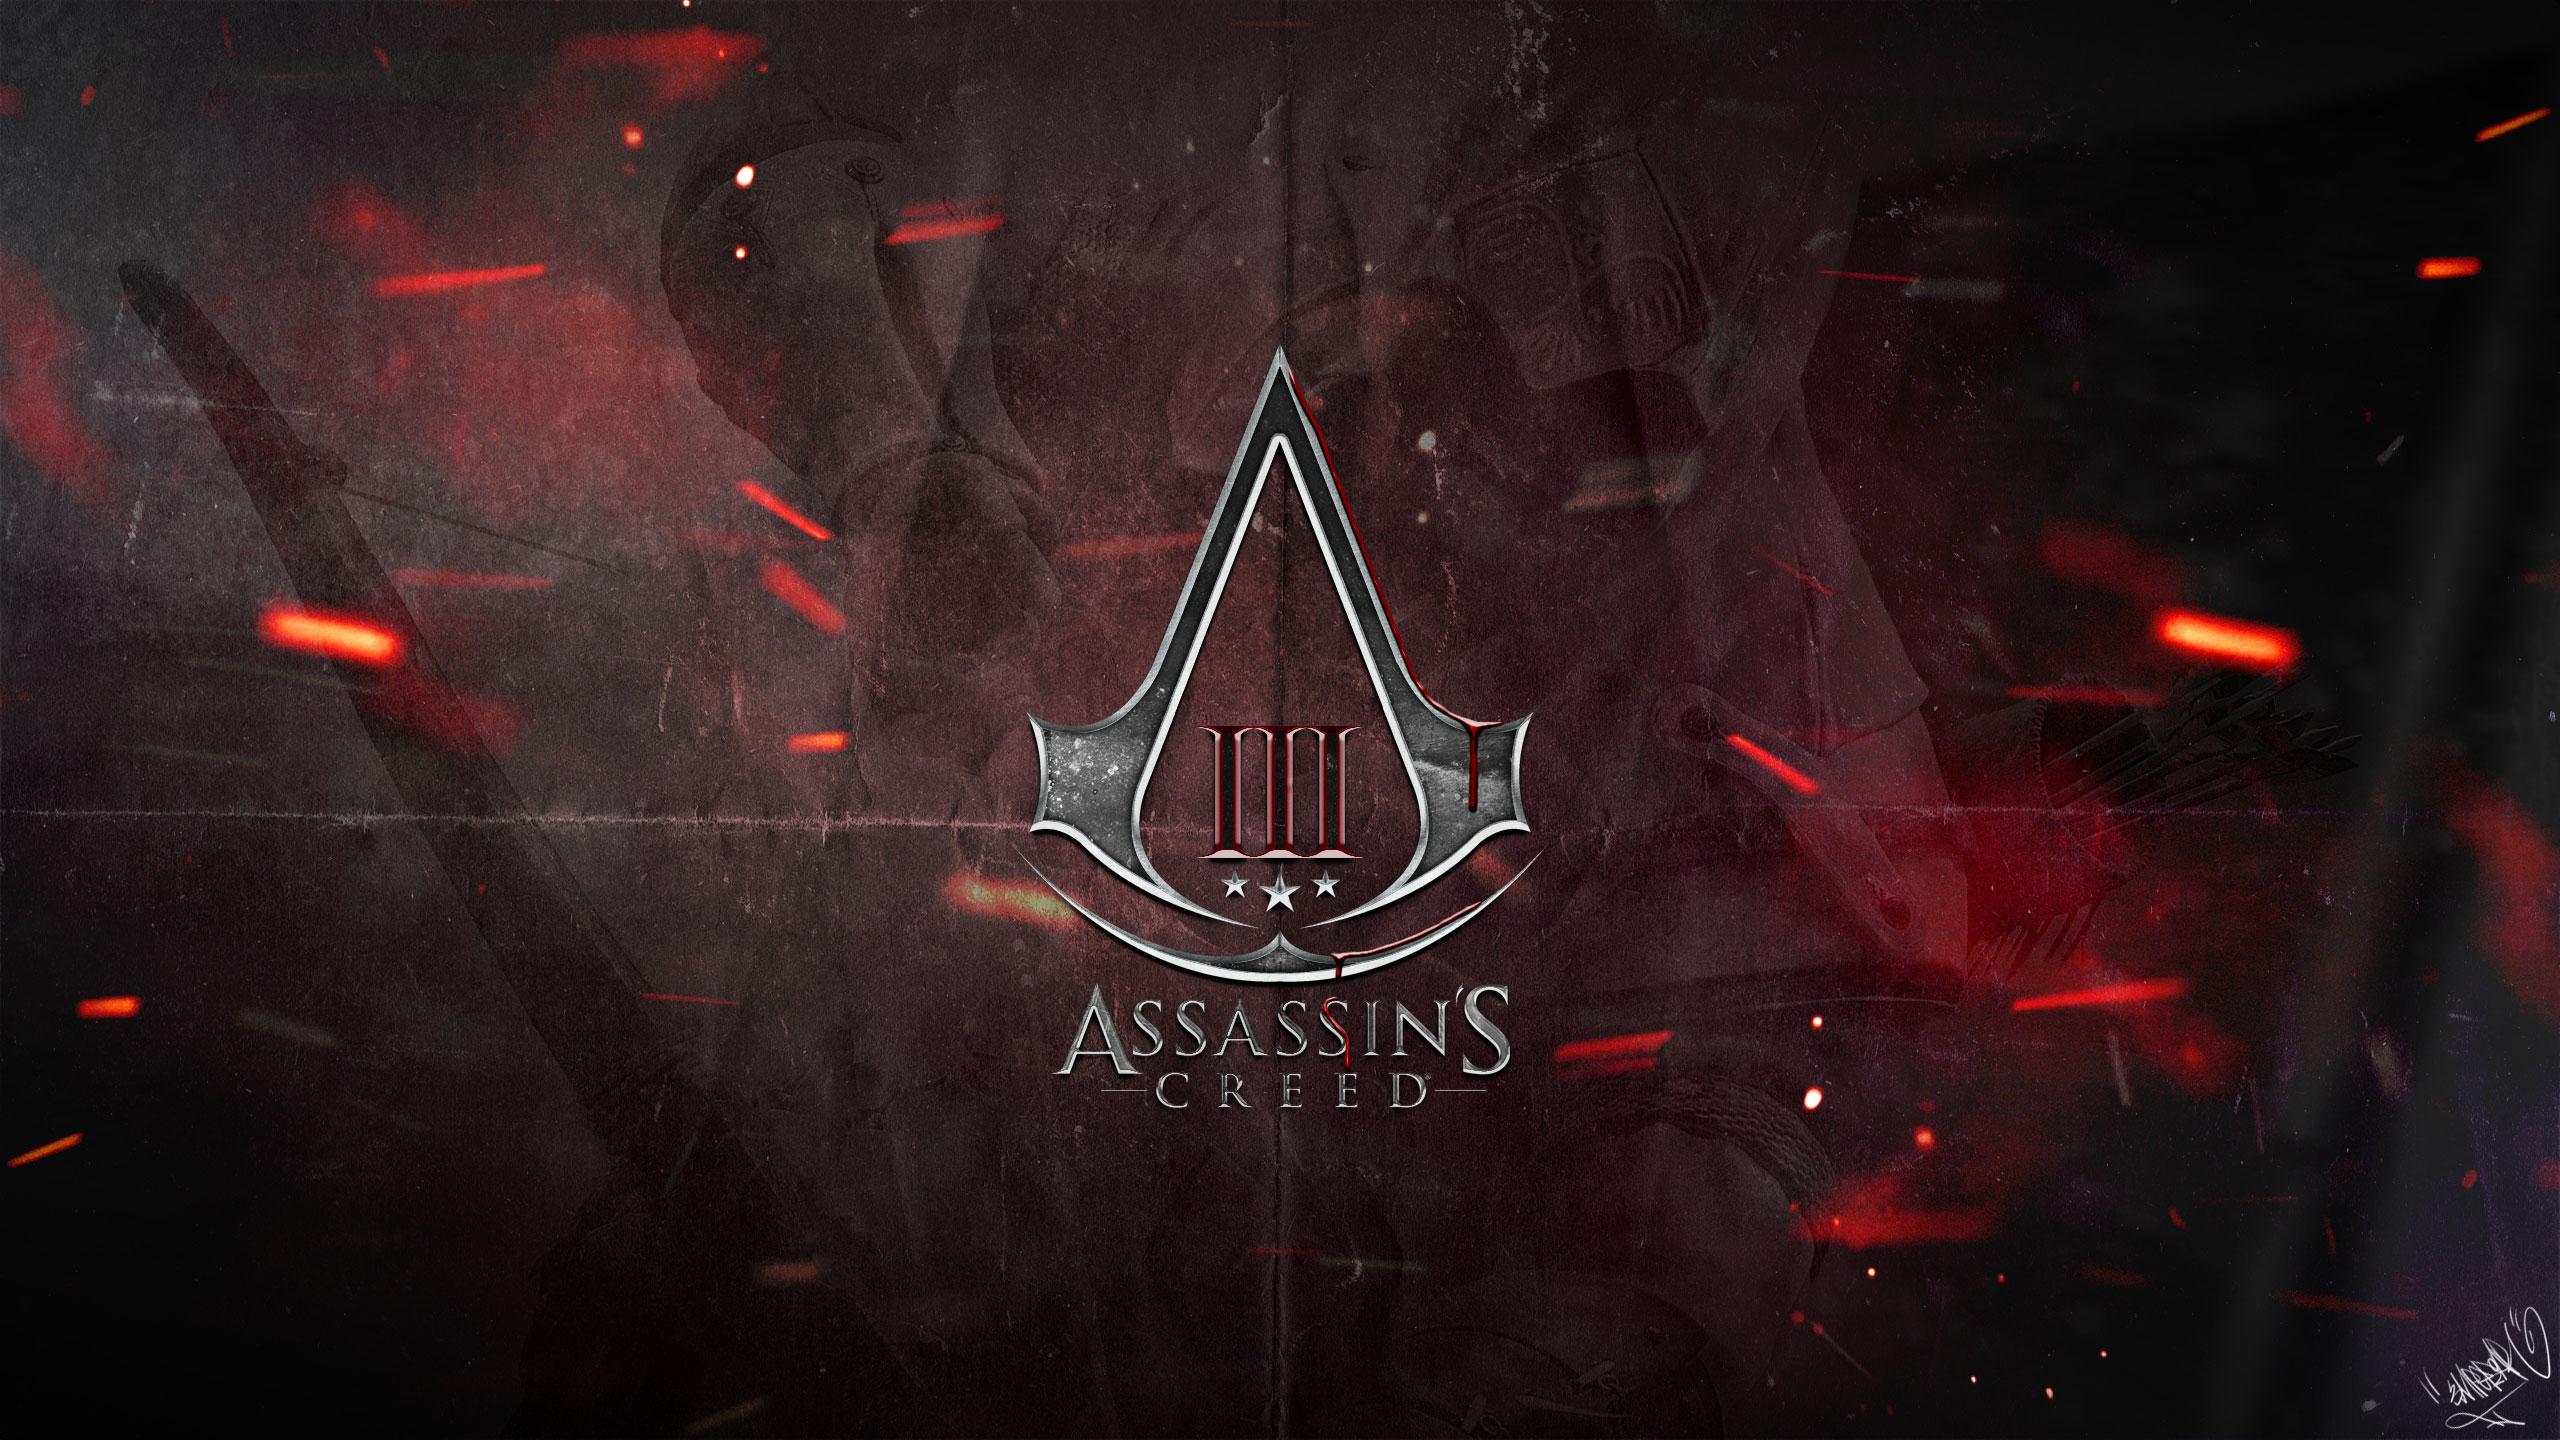 Assassin s Creed 3 the assassins 32112849 2560 1440jpg 2560x1440